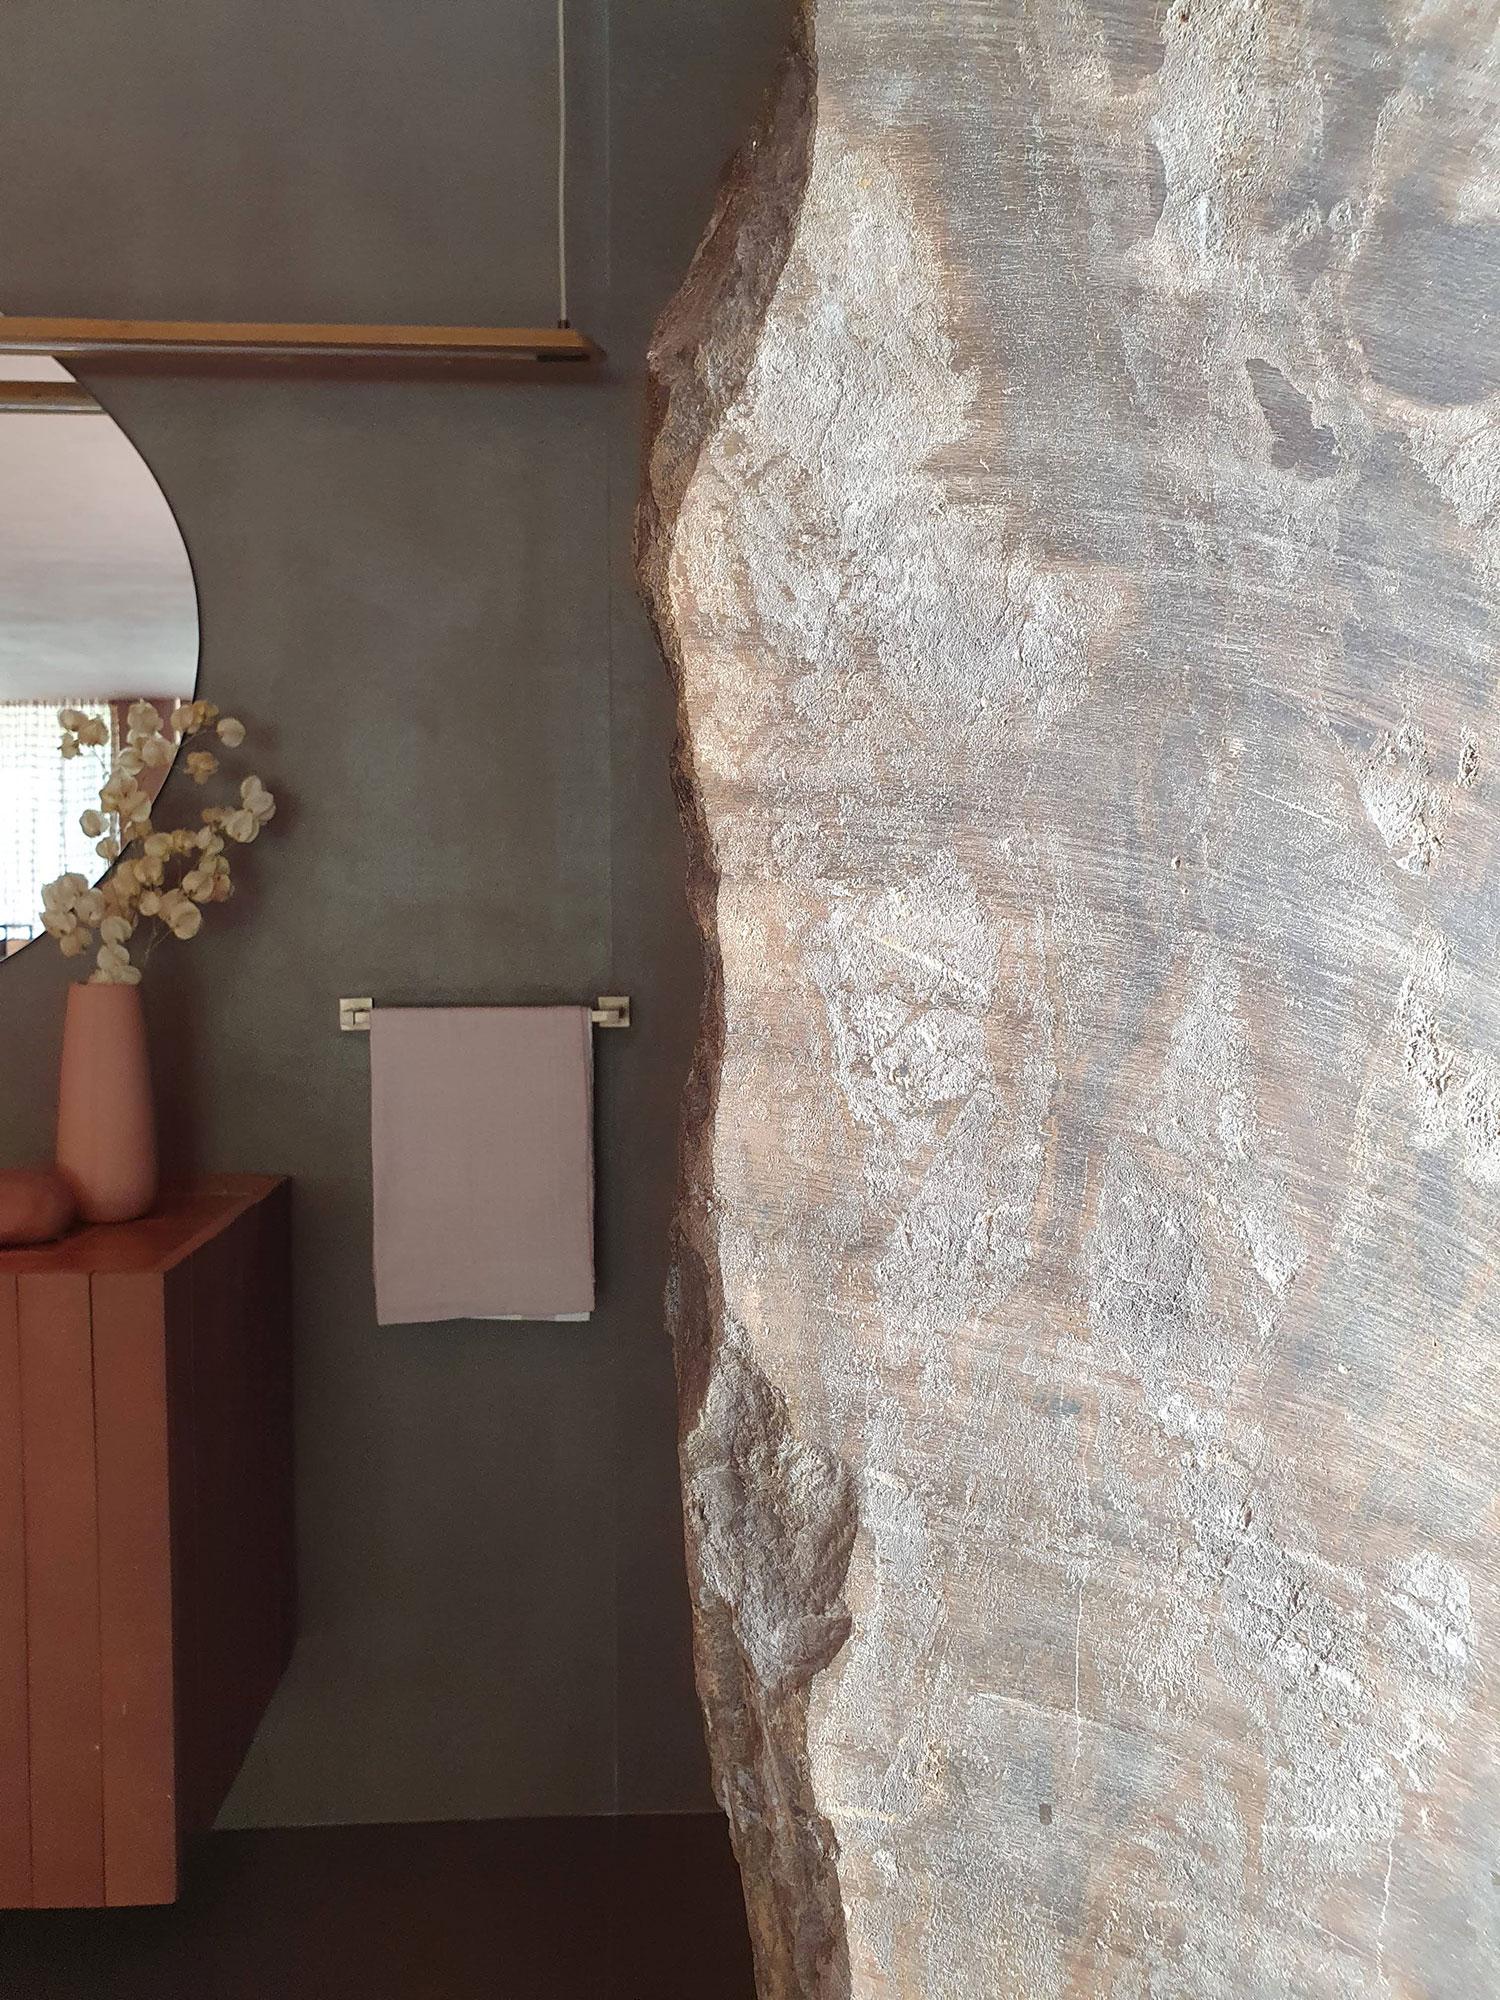 juliana pippi casacor santa catarina florianopolis 2021